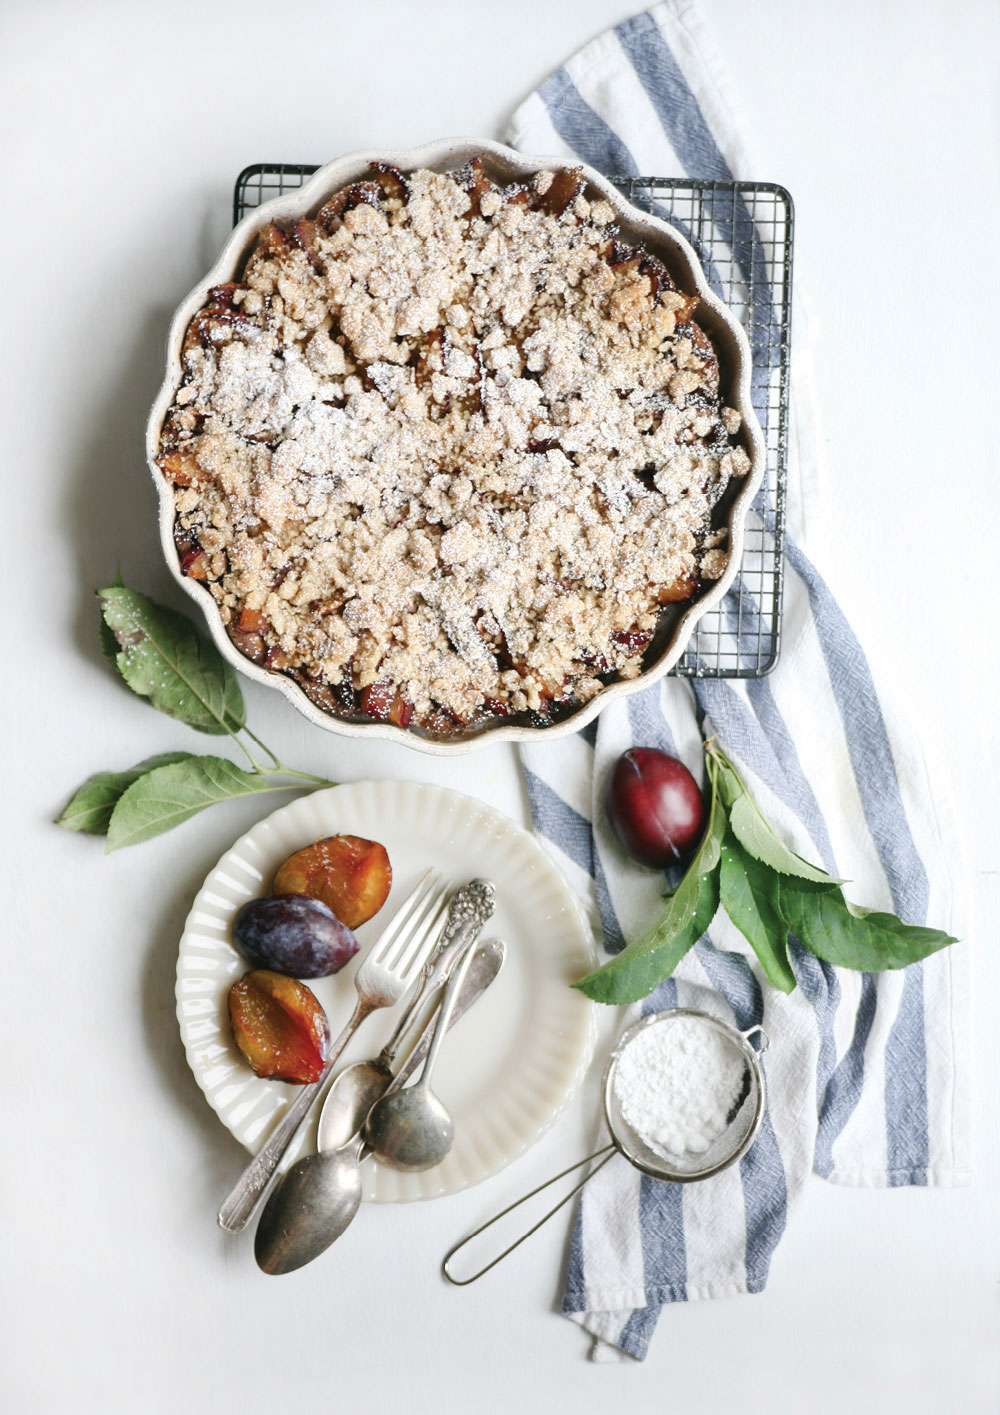 Gluten-Free-Crumble-Plum-Pie-Pure-Ella-Leche